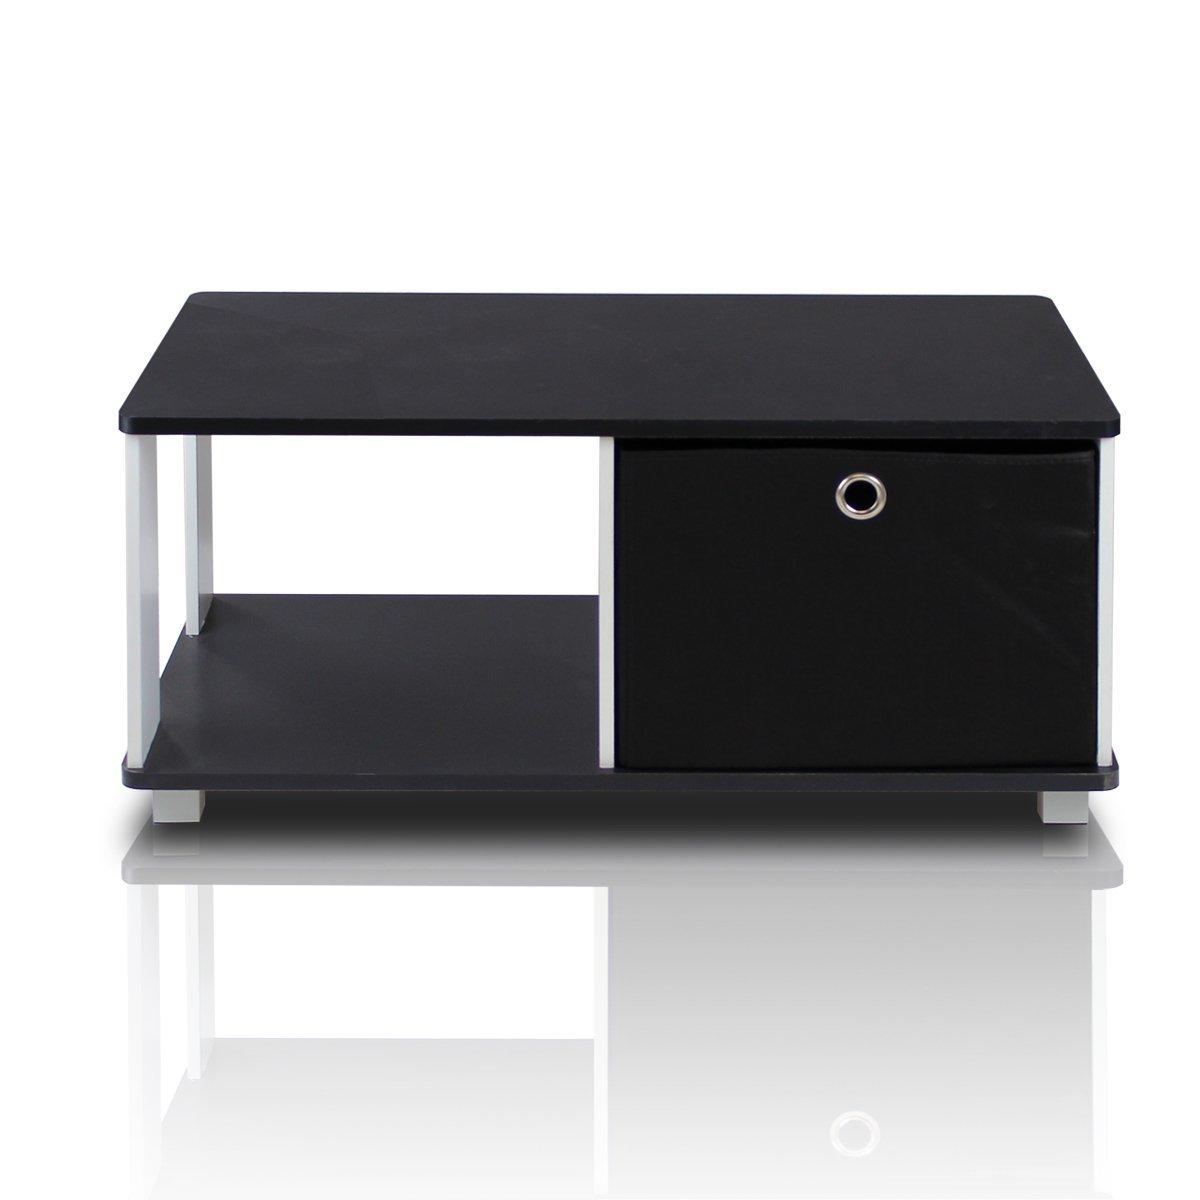 Furinno 99954BK/BK Coffee Table with Bin Drawer, Black & White